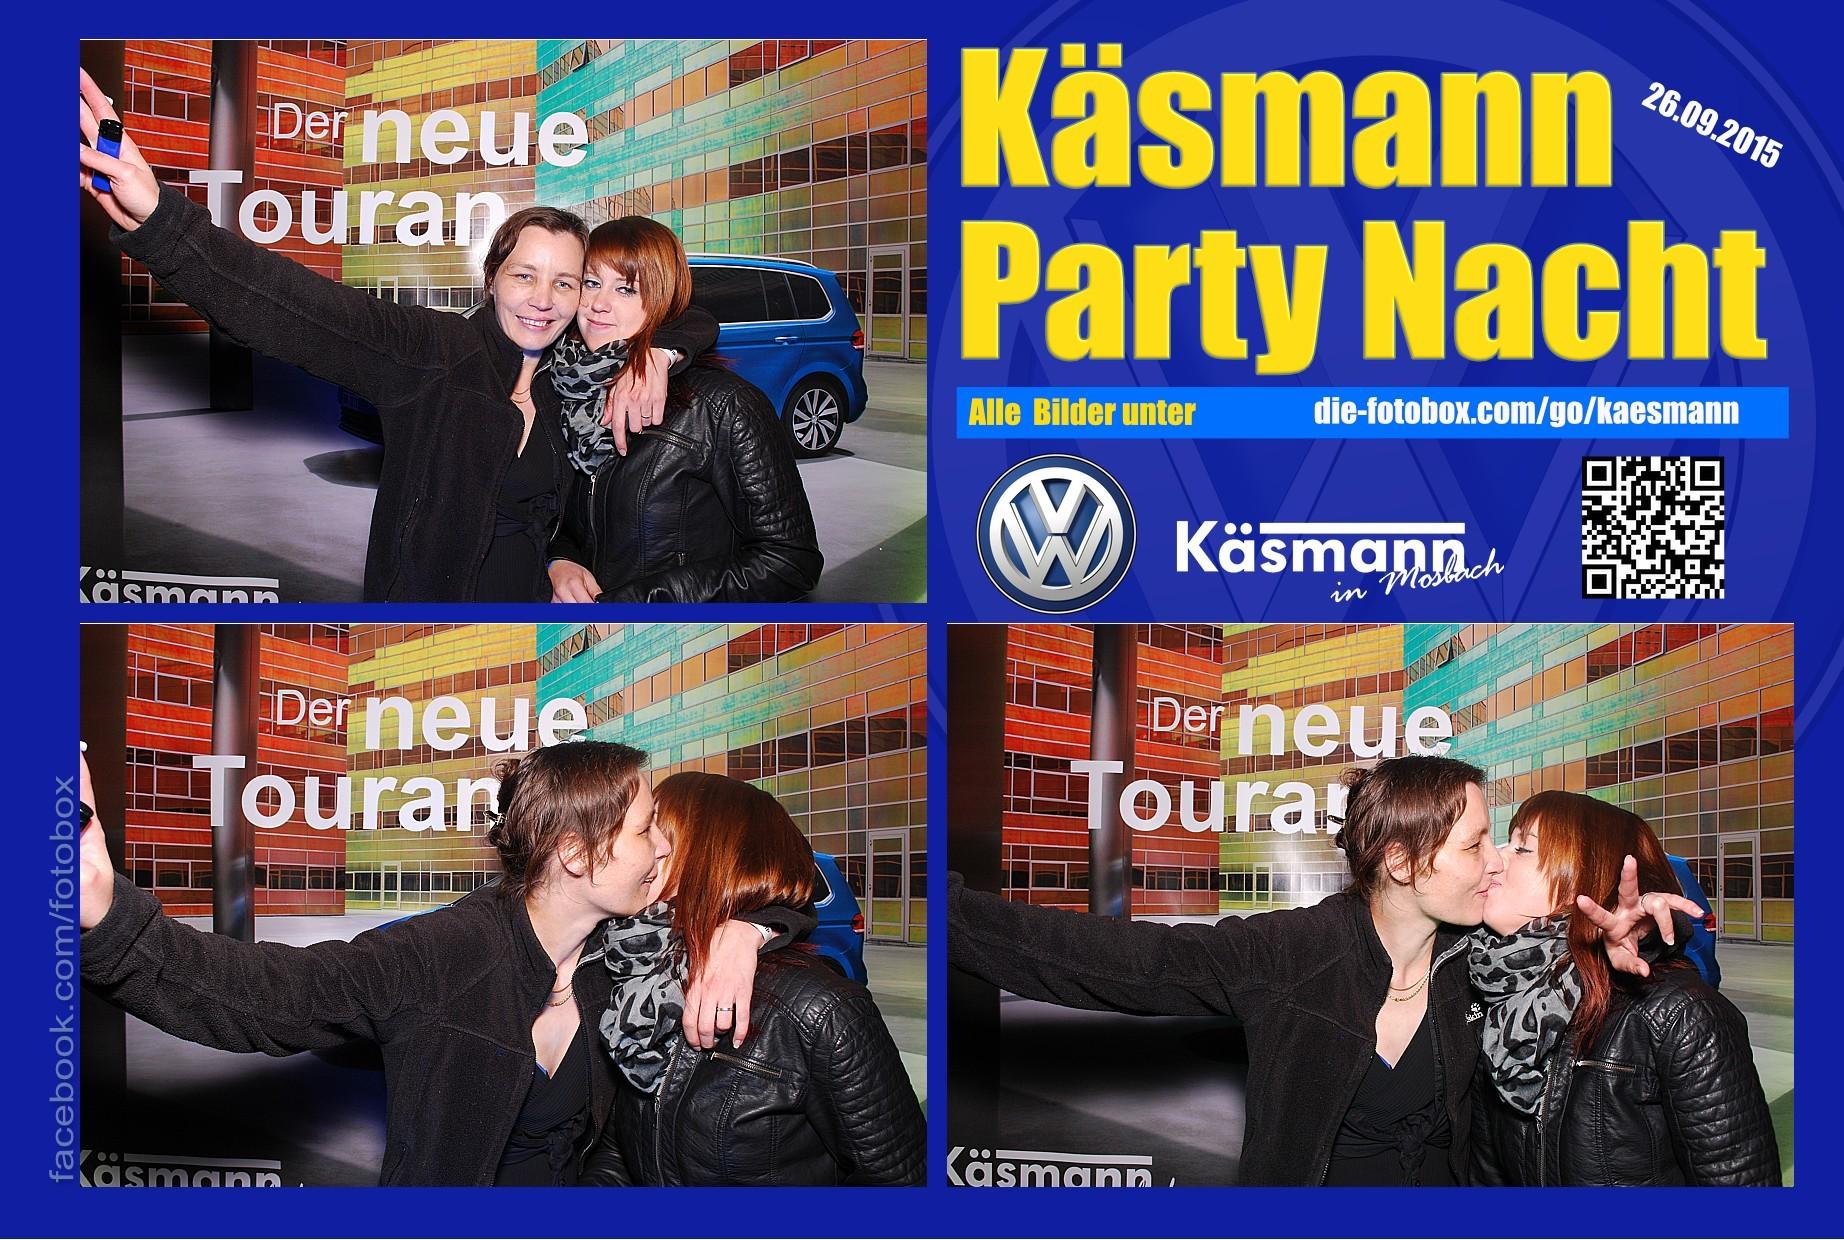 Käsmannparty 2015 - www.die-fotobox.com 01379